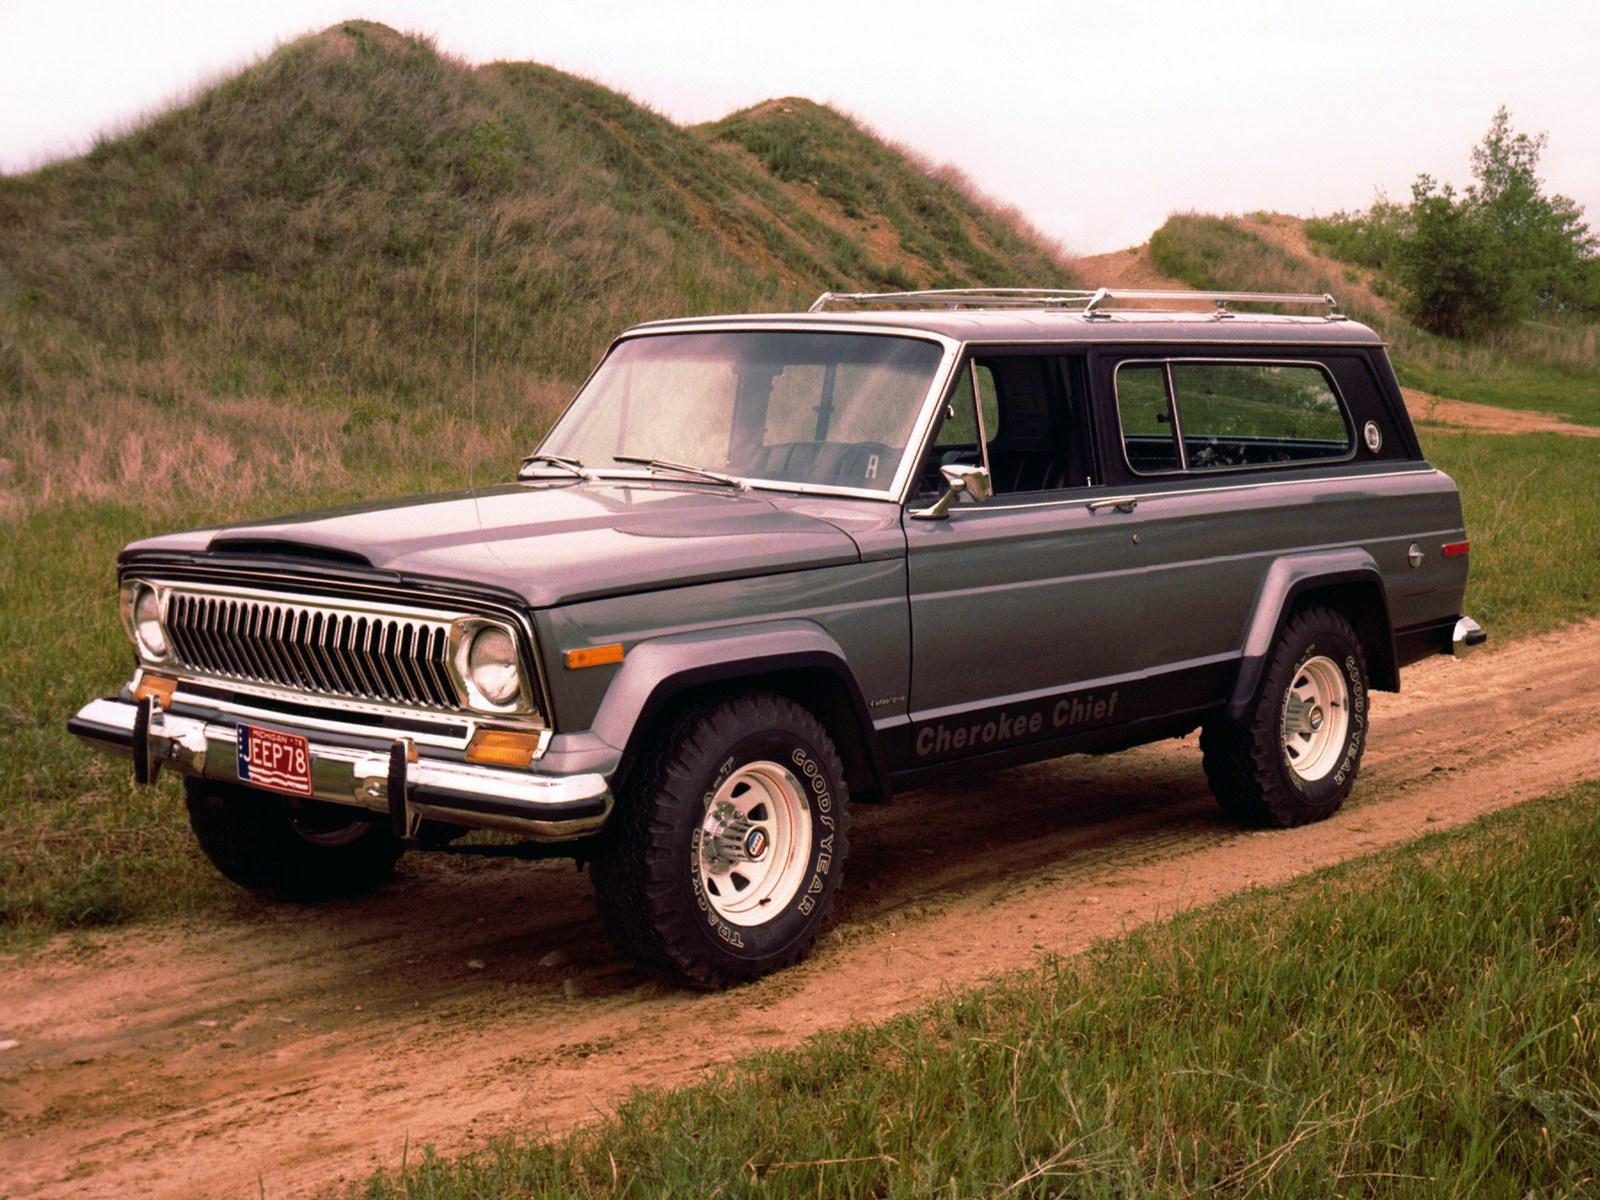 1976-1978. Jeep Cherokee Chief (SJ)